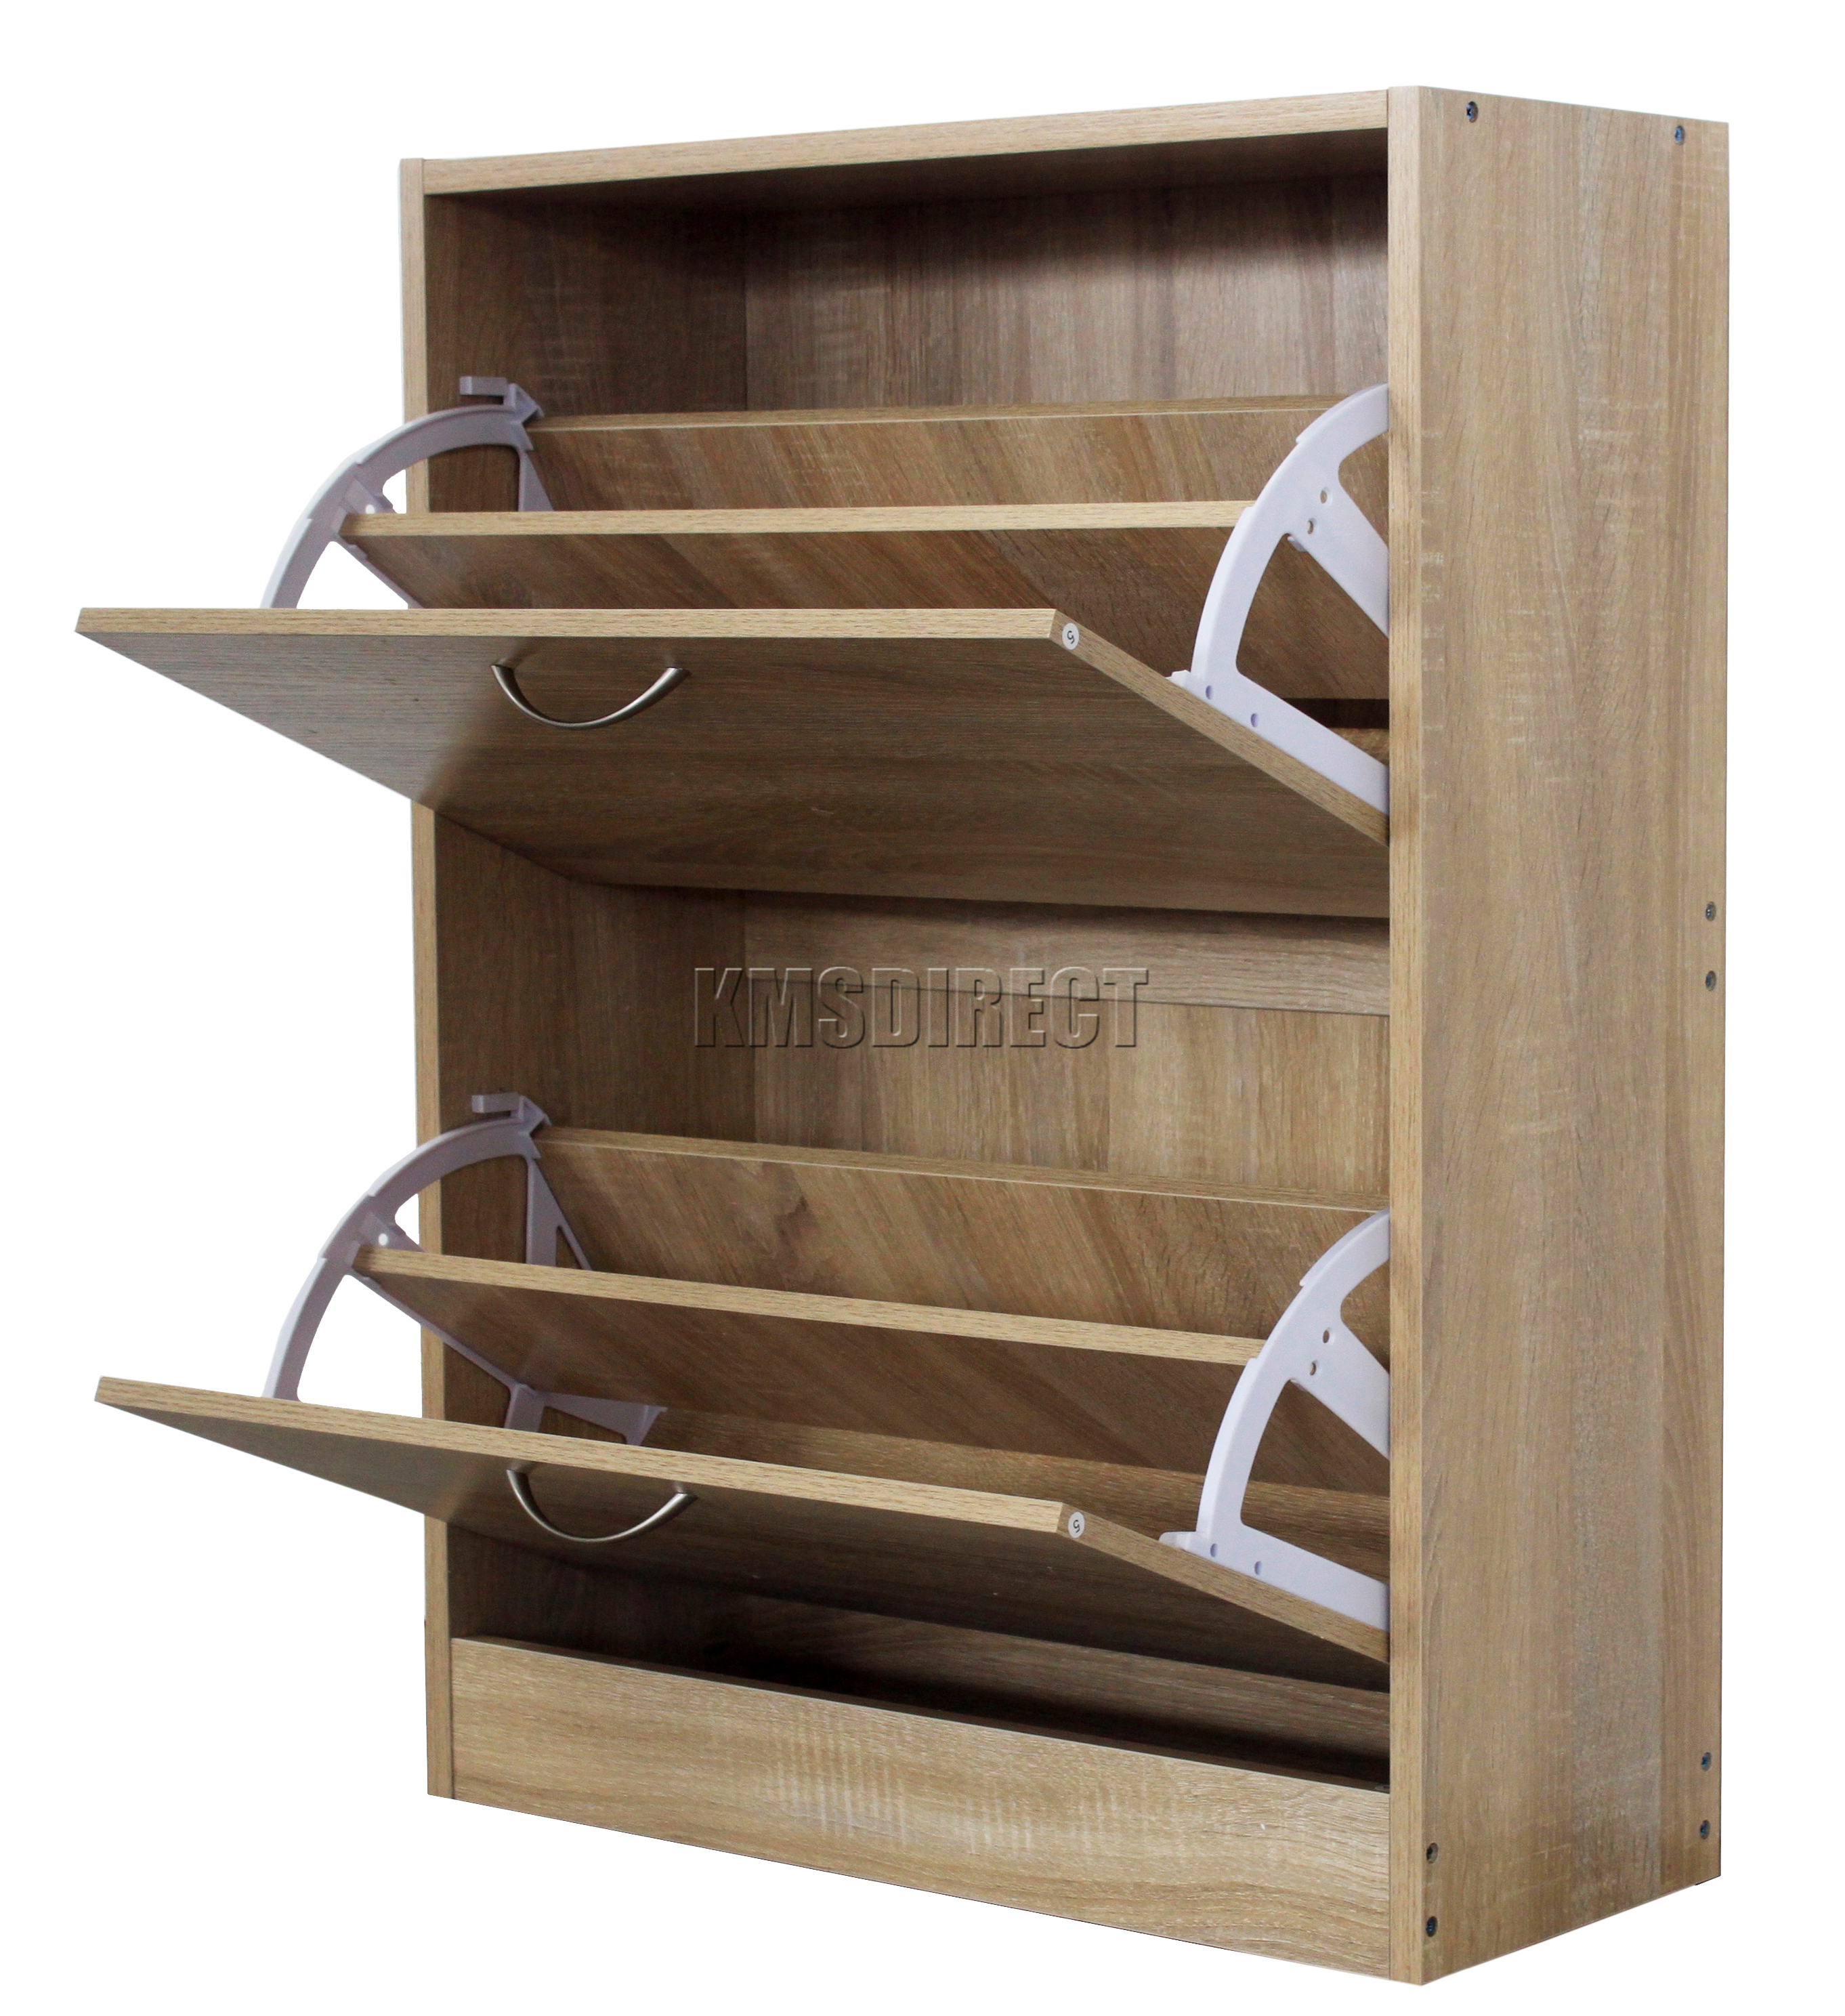 Sentinel Westwood Shoe Rack Solid Wood Storage Cabinet Footwear Drawer Stand